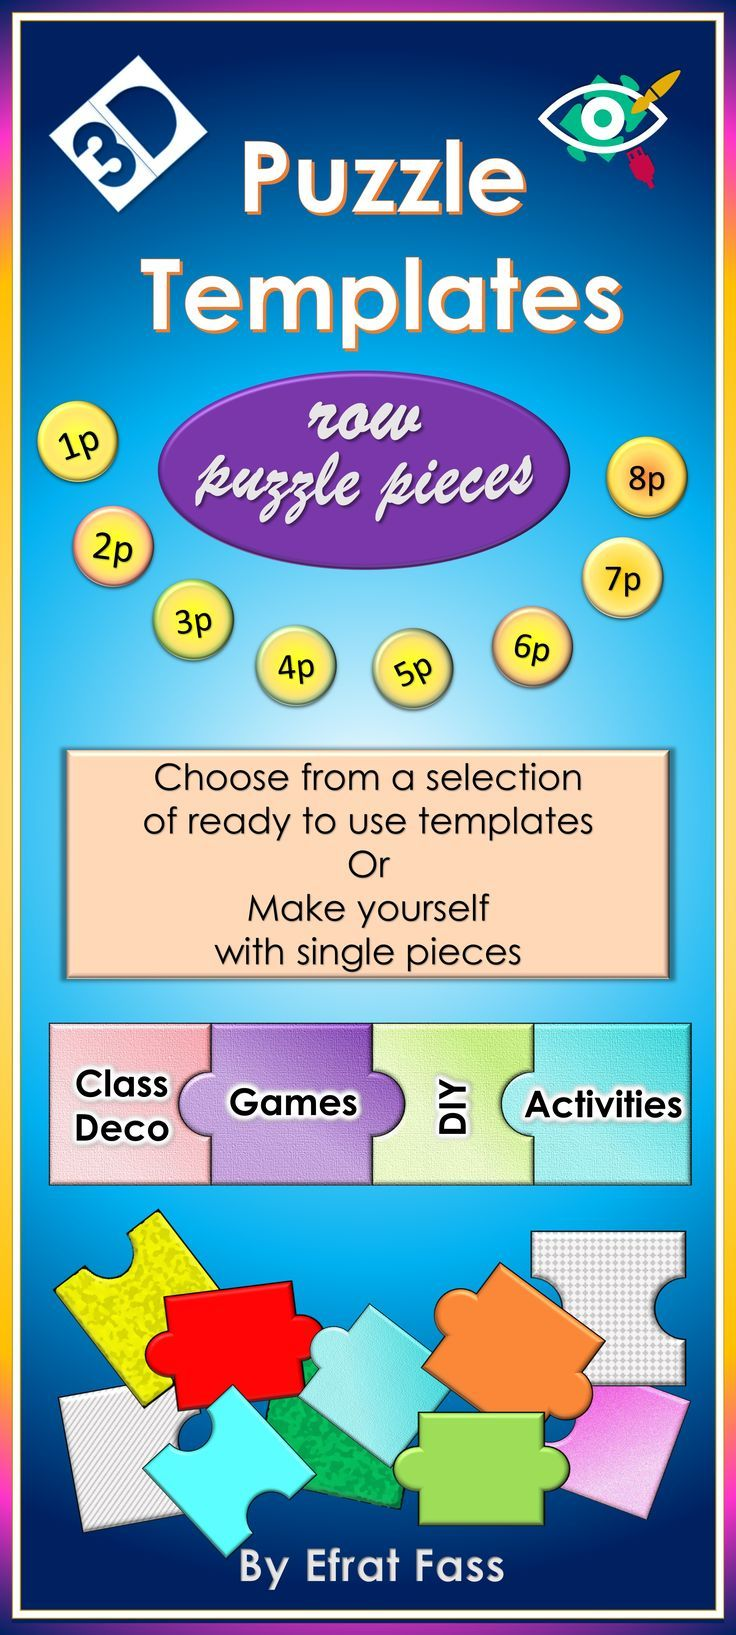 3d row puzzle templates especially for educators. teachers